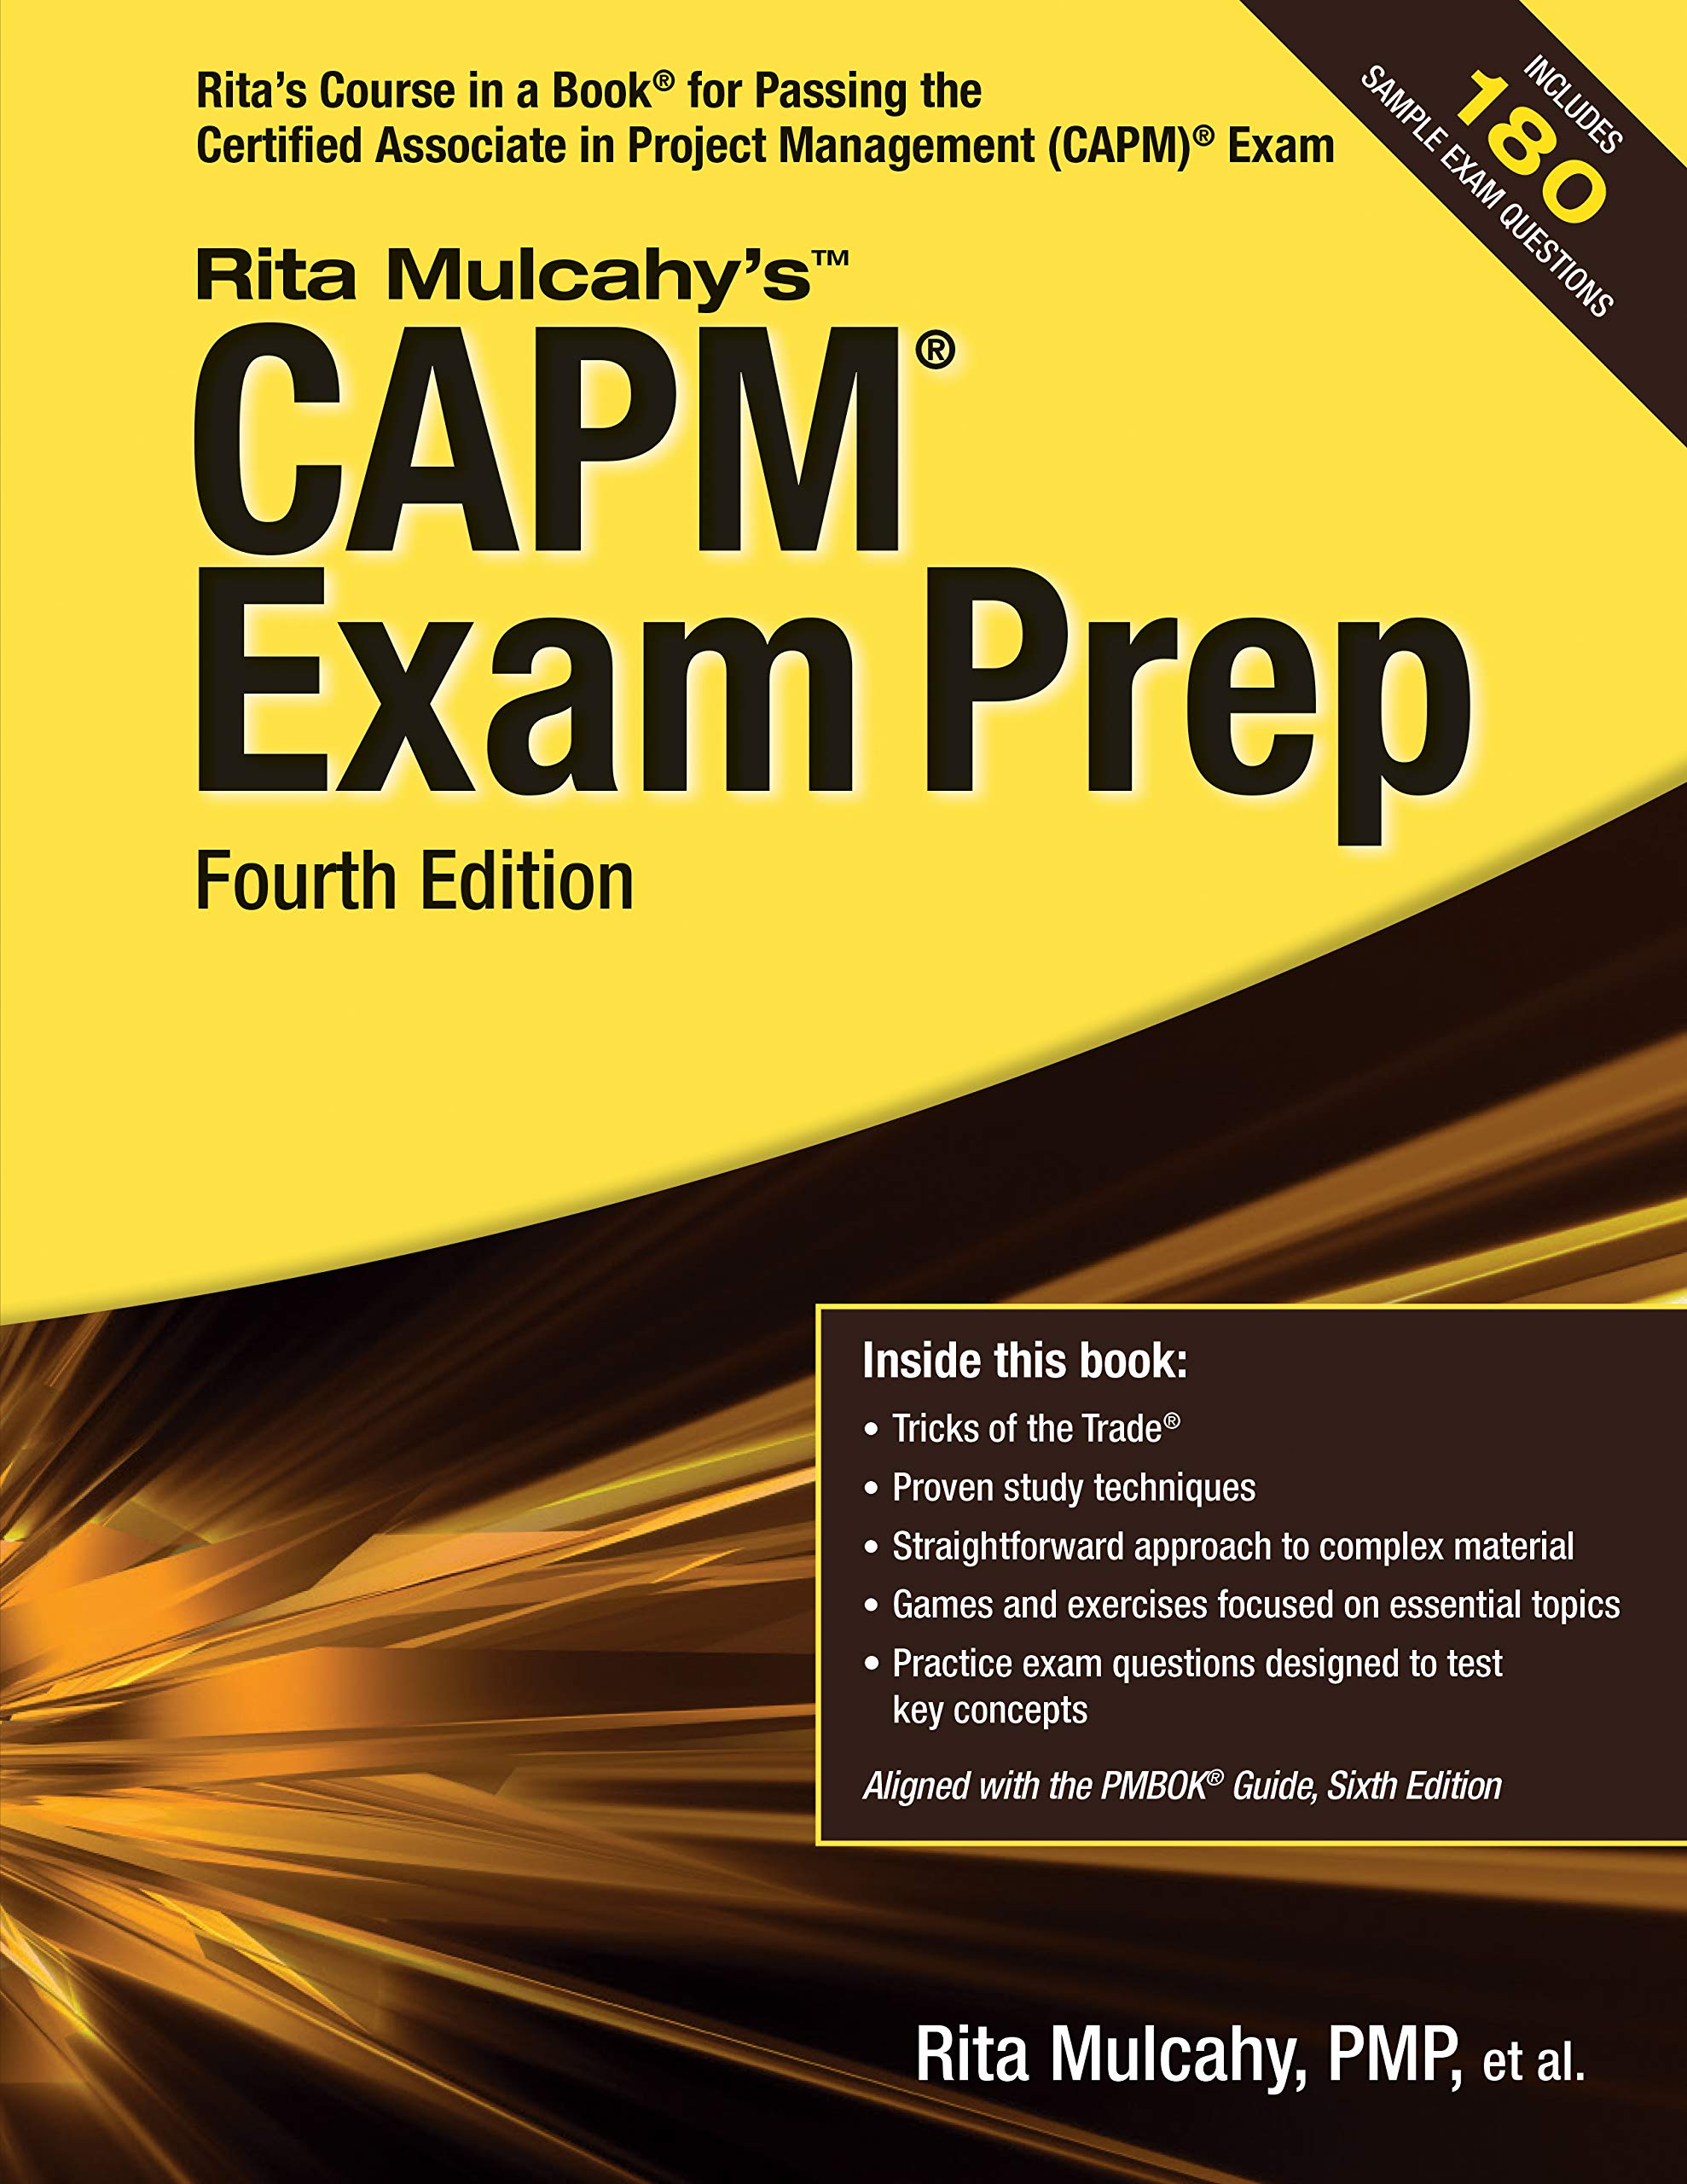 capm exam prep rita mulcahy pdf free download